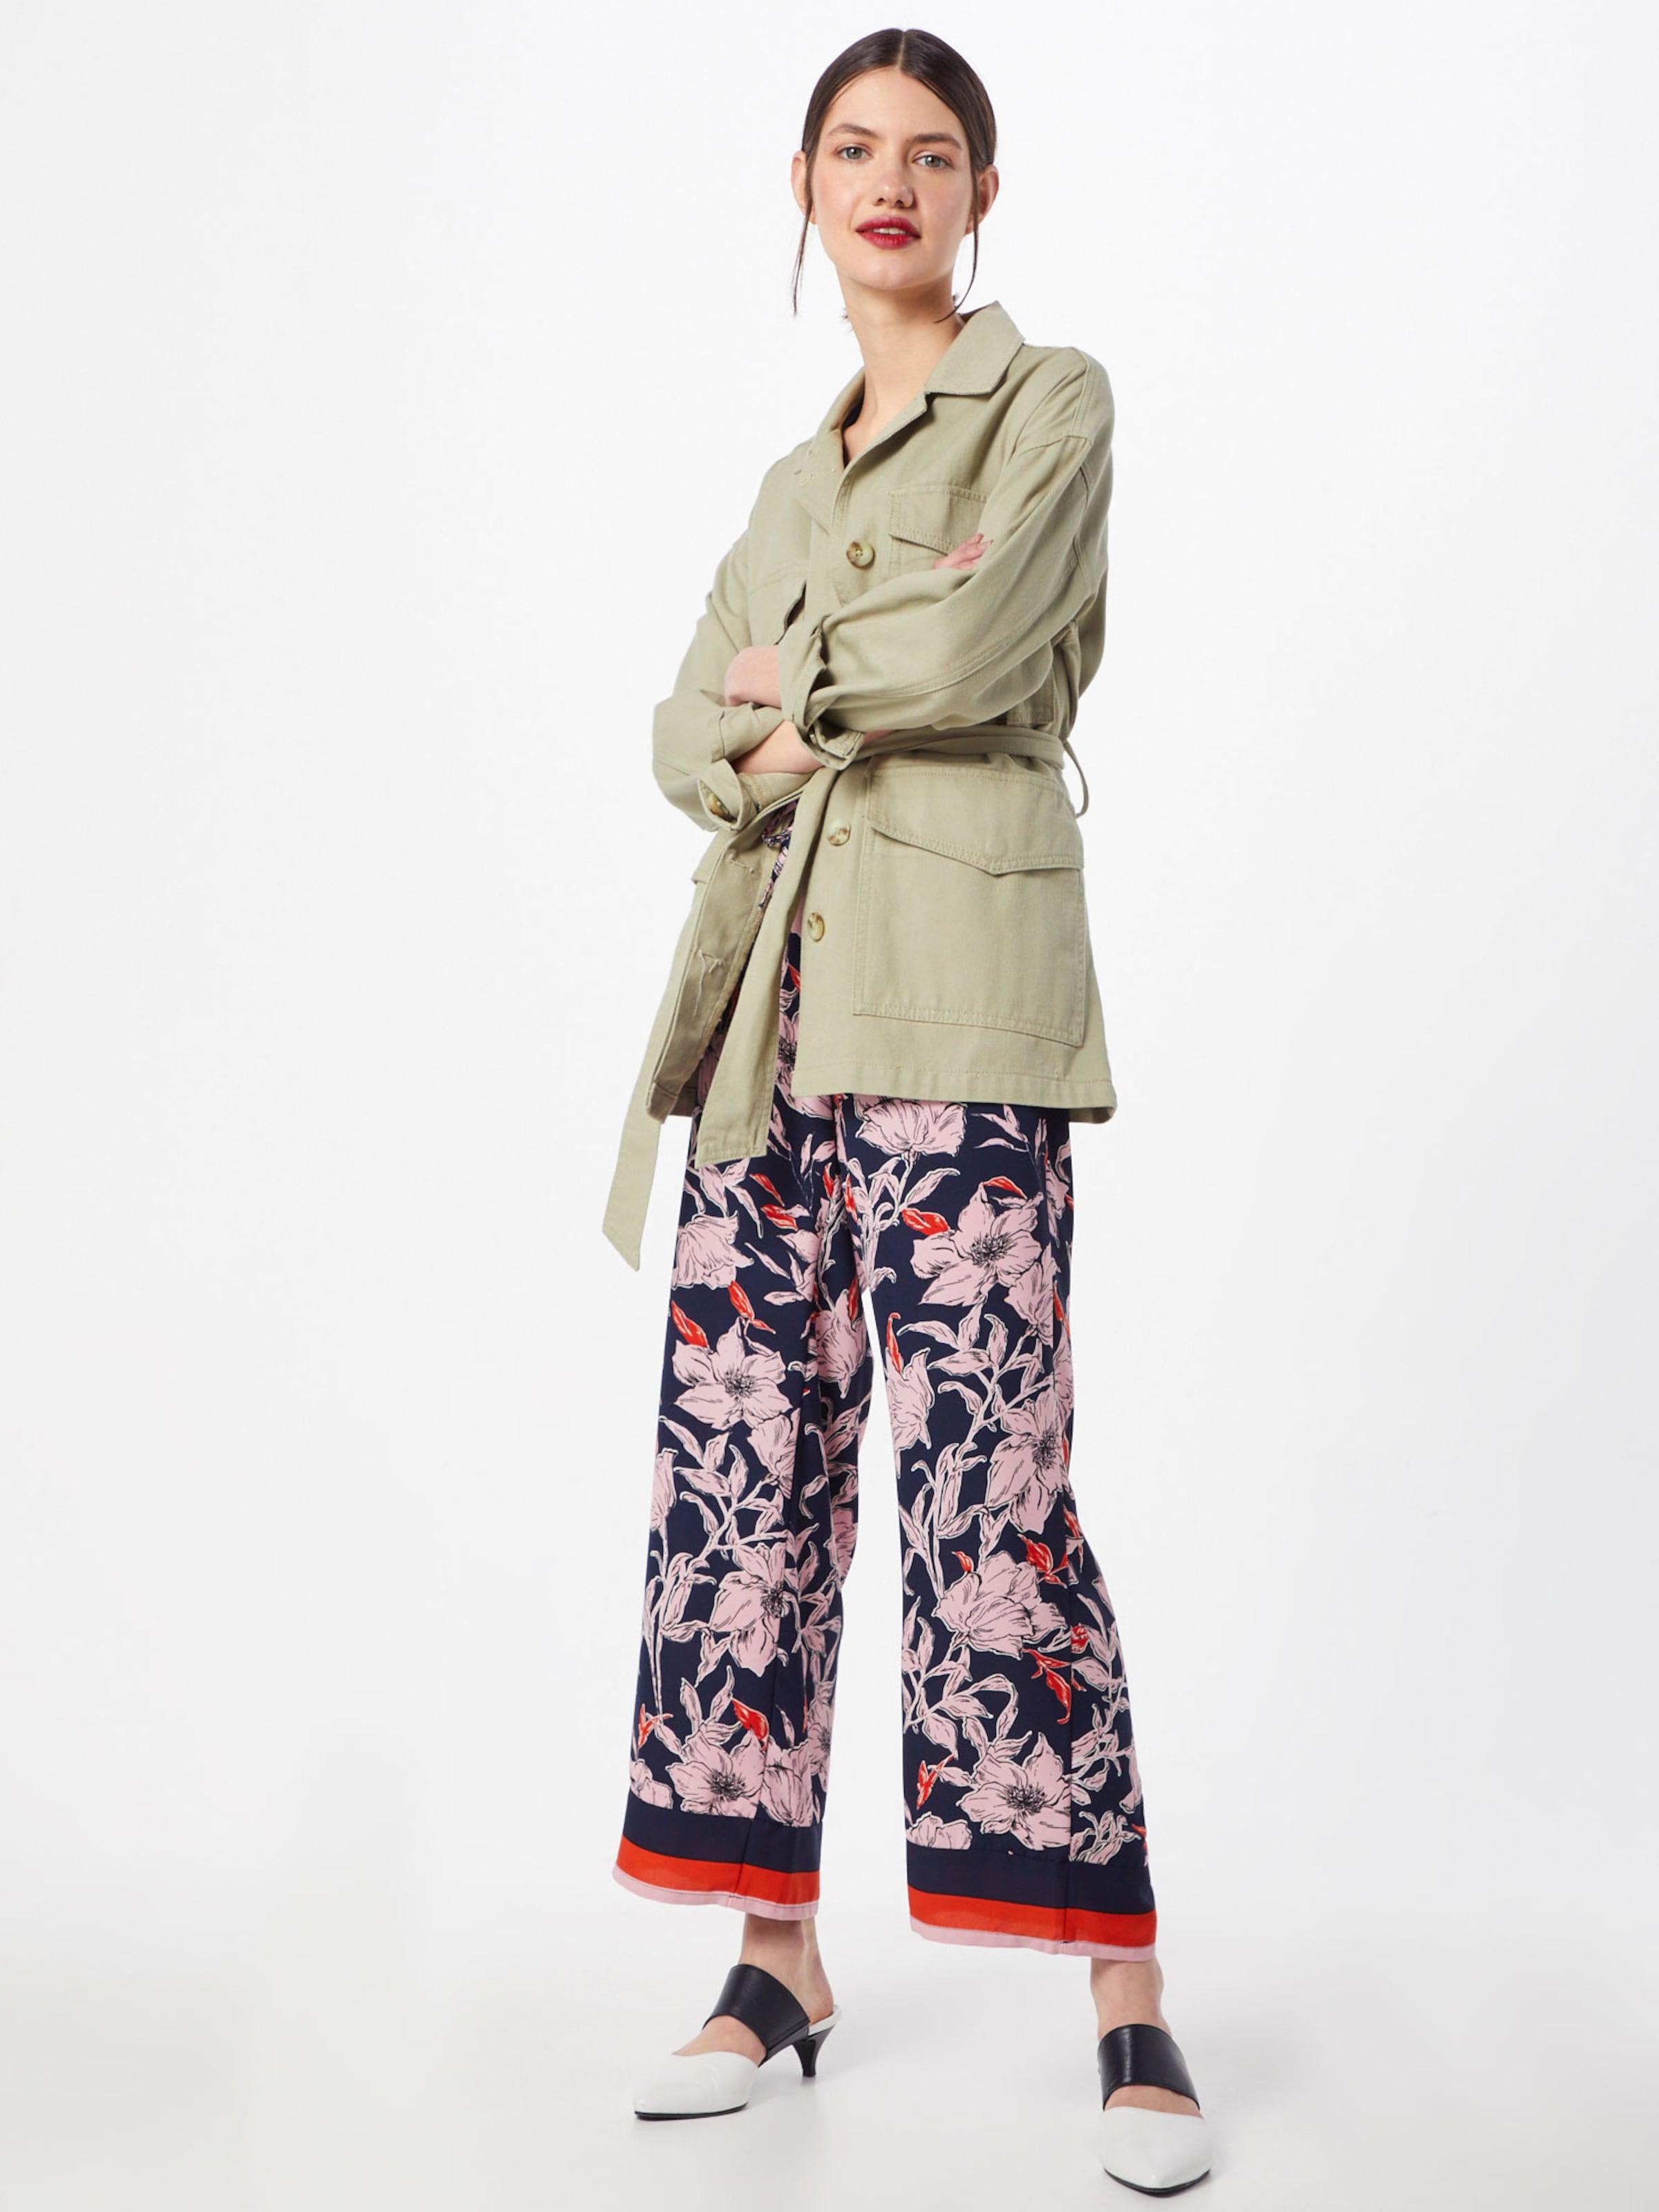 Exp' DonkerblauwRosa Rood Wvn Ank In Jacqueline Yong De Pant 'jdyyadira Broek HIW9E2D